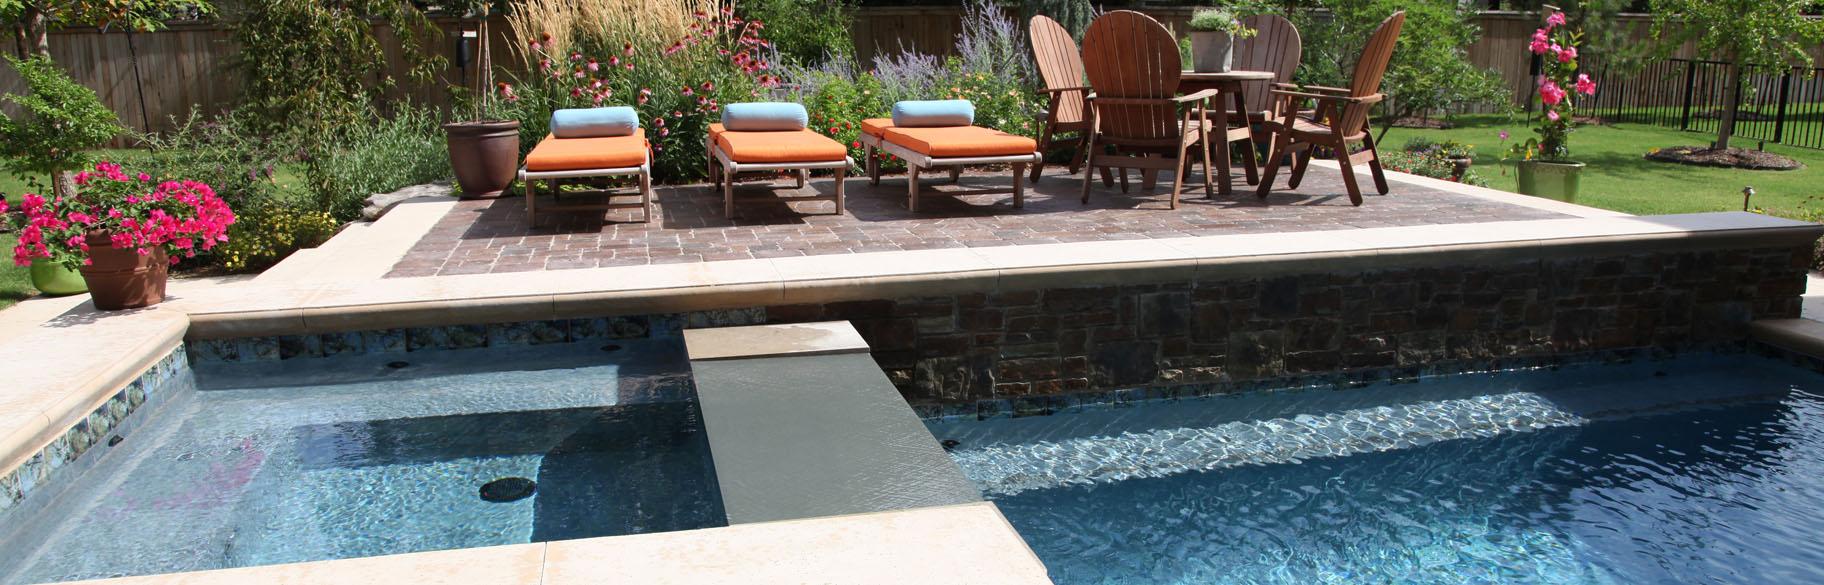 Pools & Patios 2